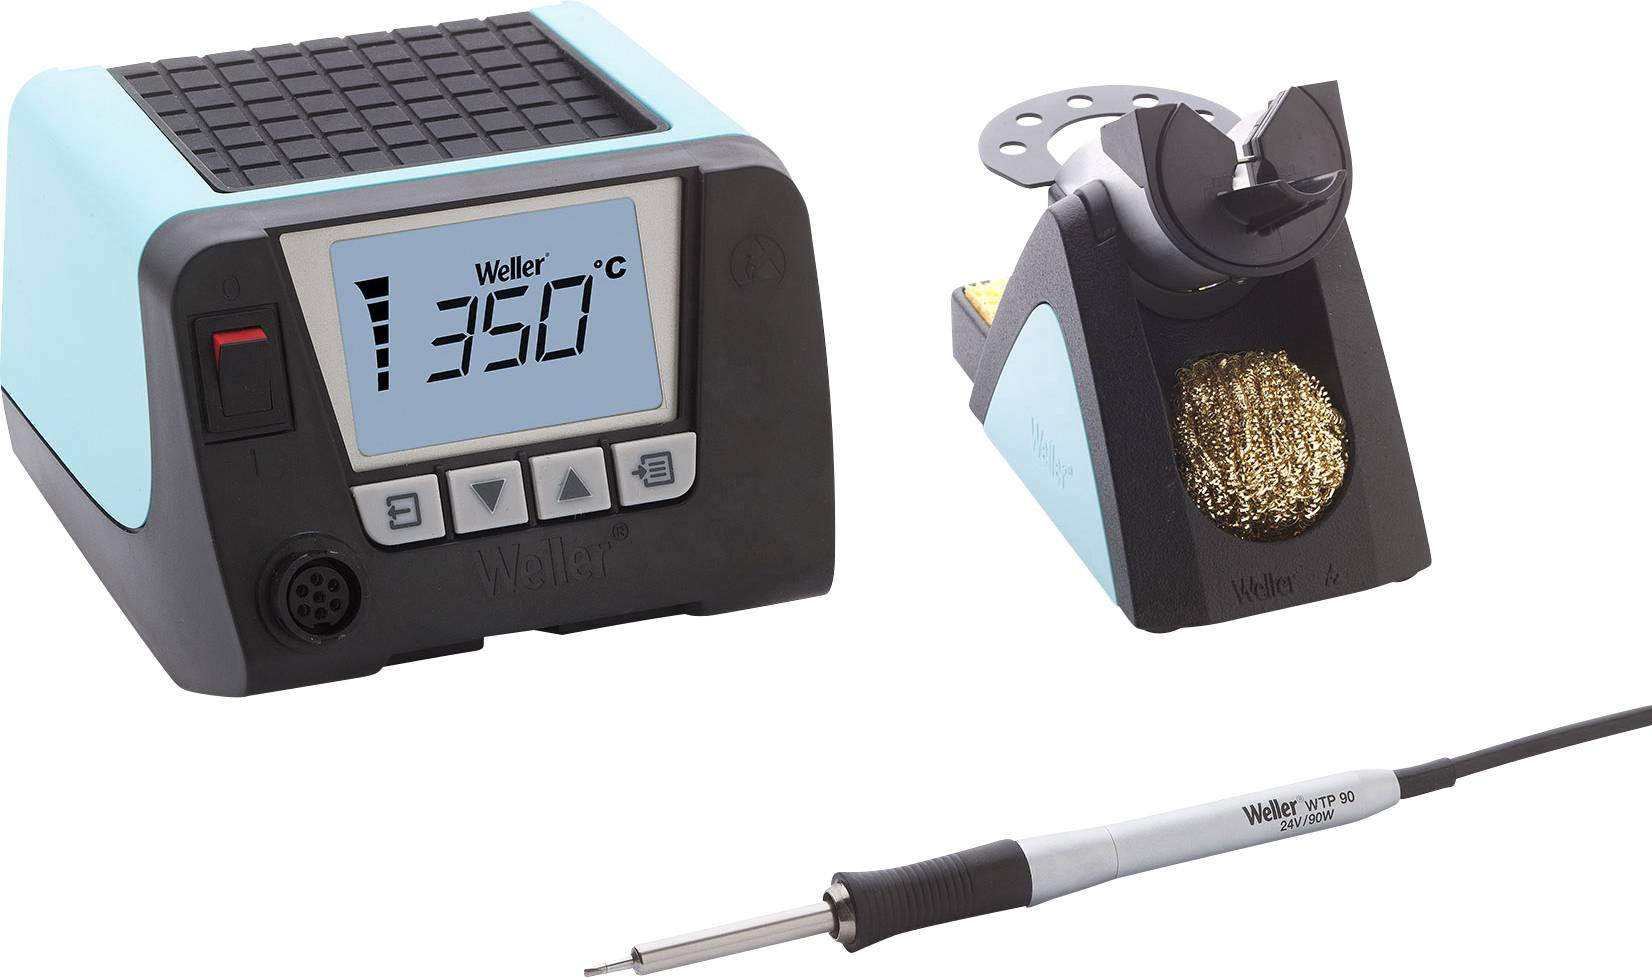 Sada pájecí stanice Weller Professional WT 1010 T0053436699, digitální, 90 W, 50 až 550 °C